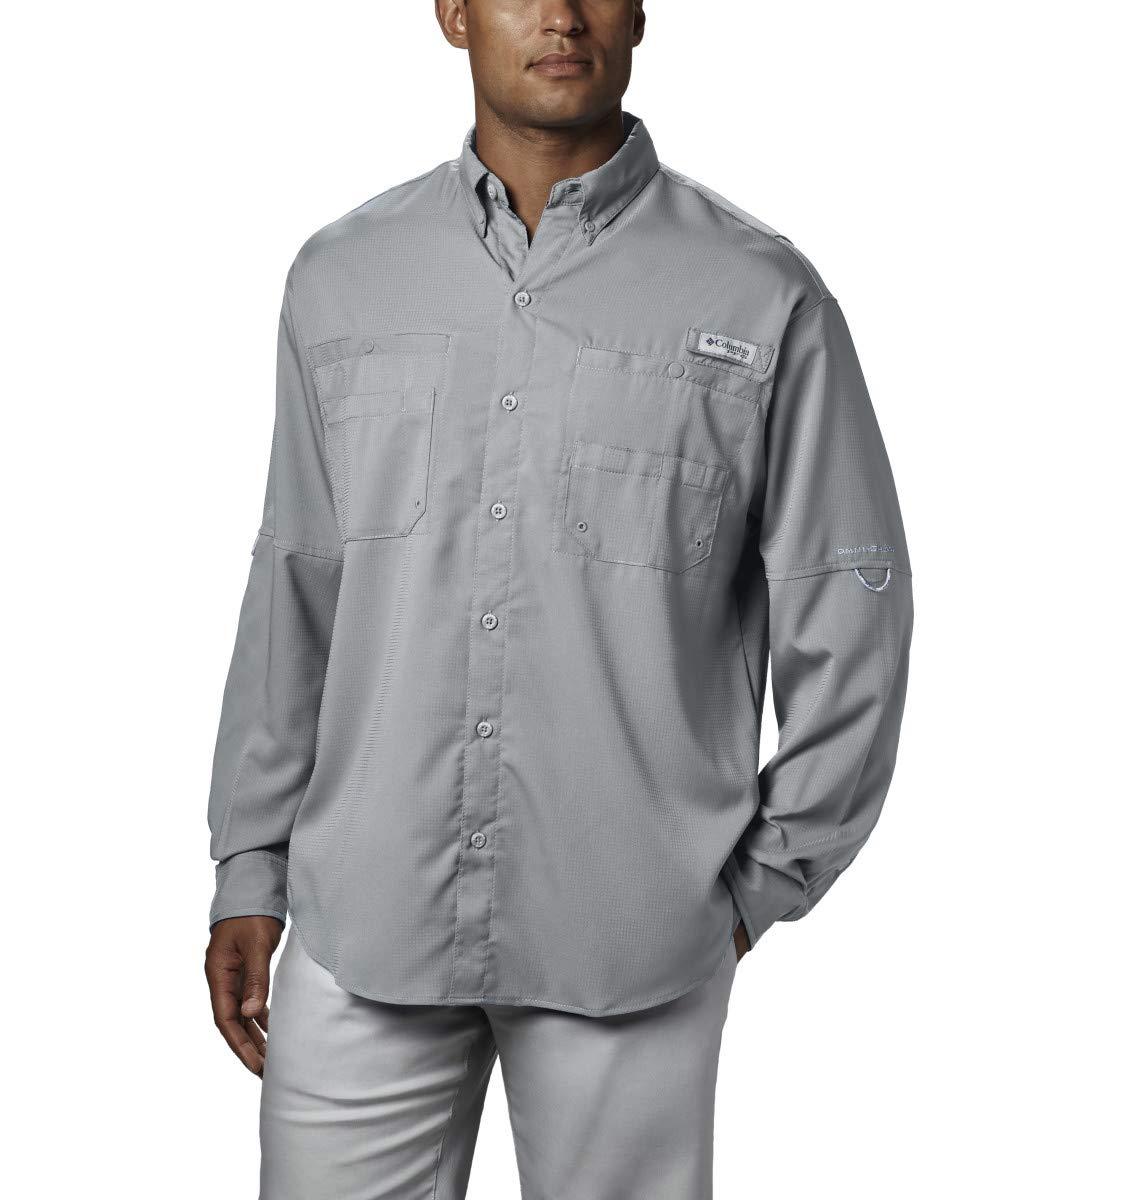 Columbia Men's PFG Tamiami II Long Sleeve Shirt - Big , Cool Grey, X-Small